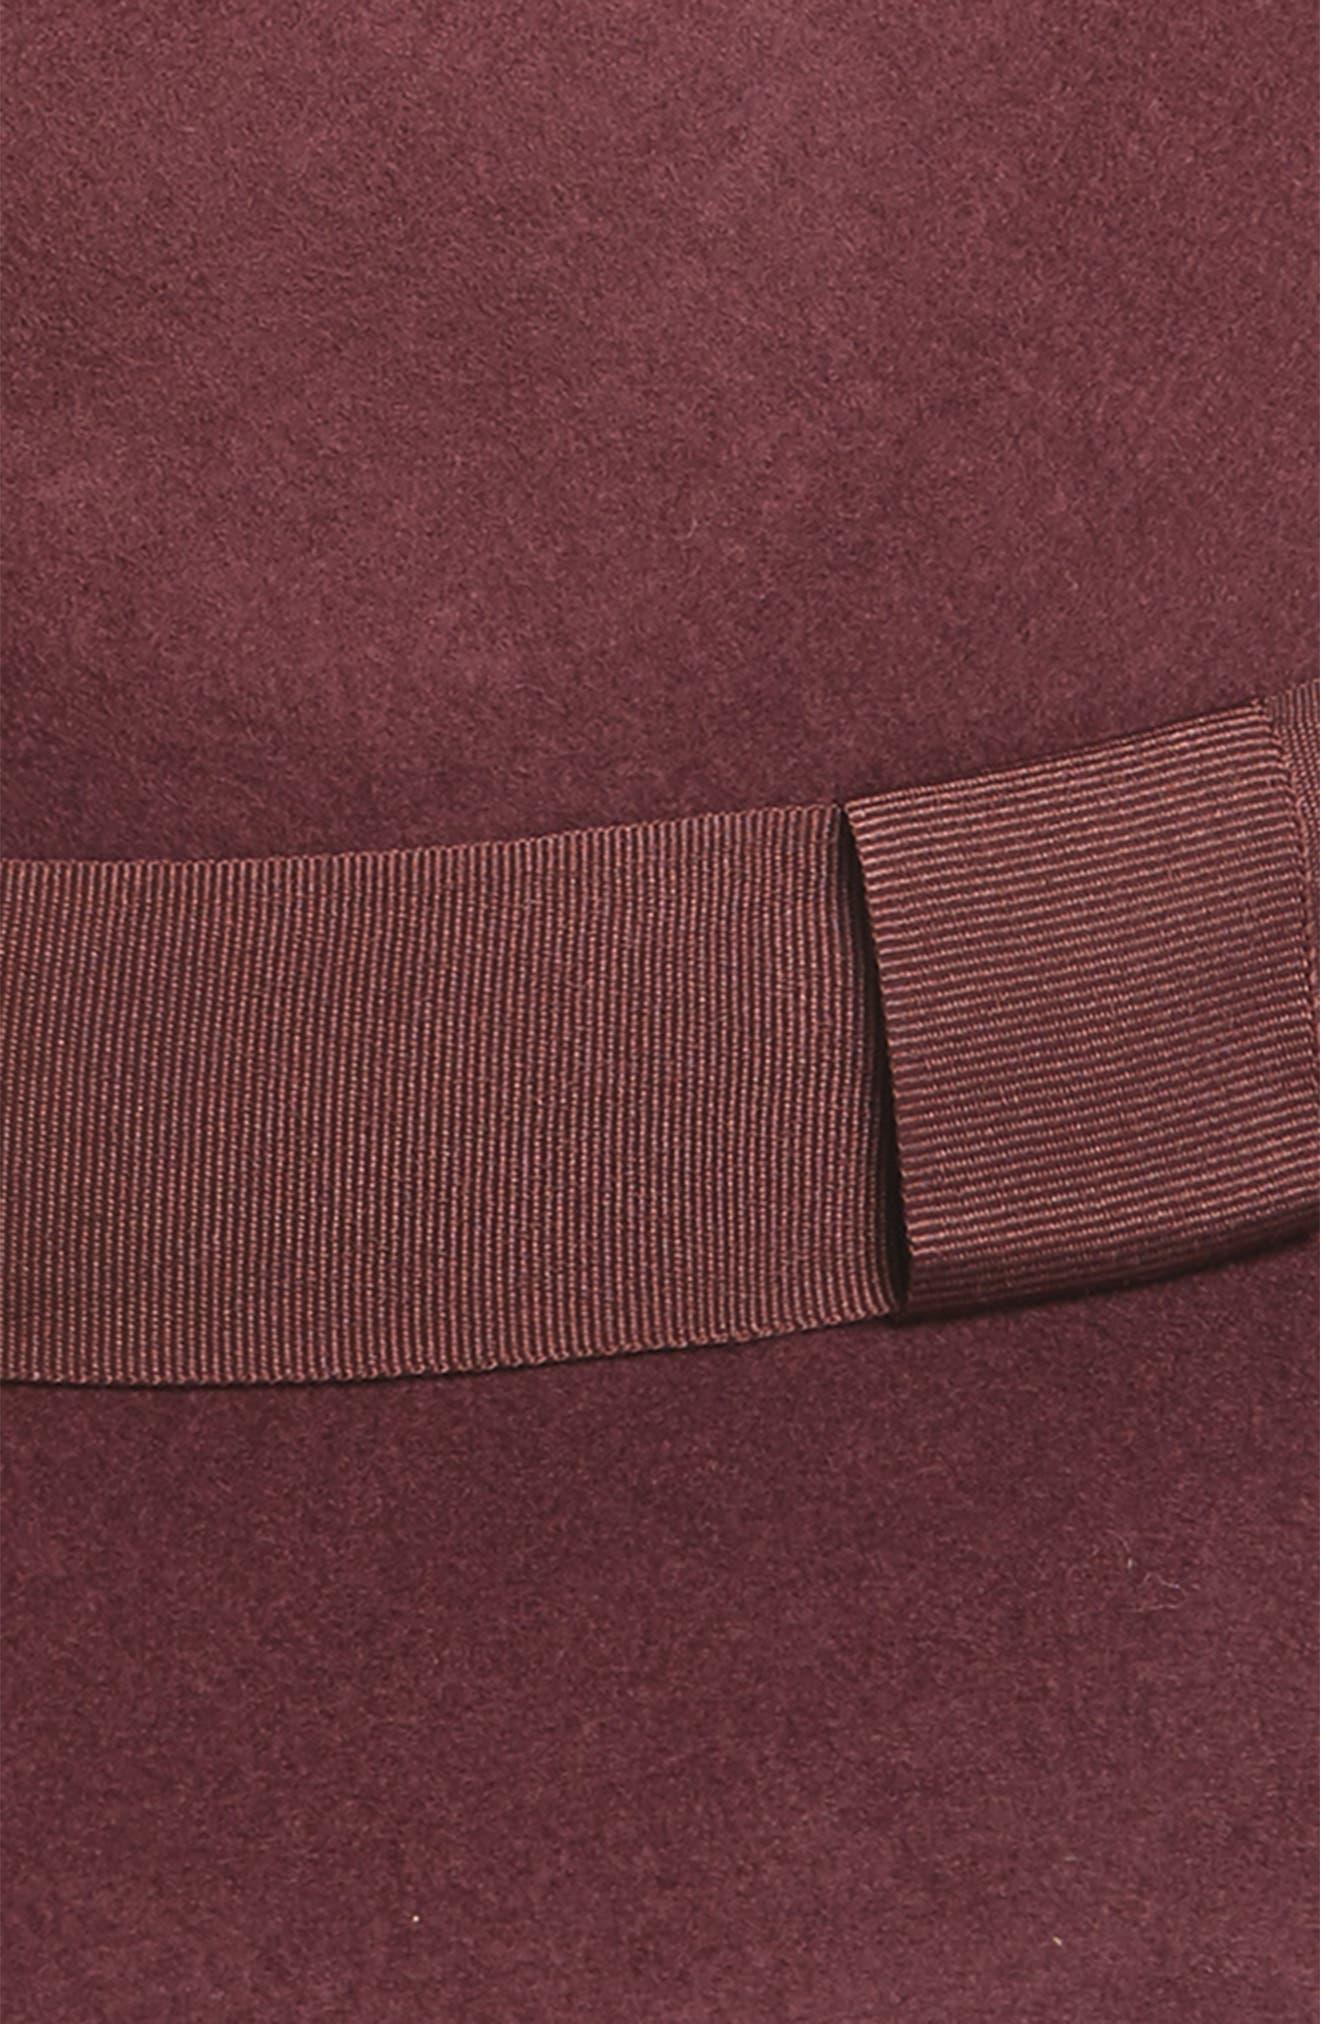 Wool Panama Hat,                             Alternate thumbnail 2, color,                             Burgundy